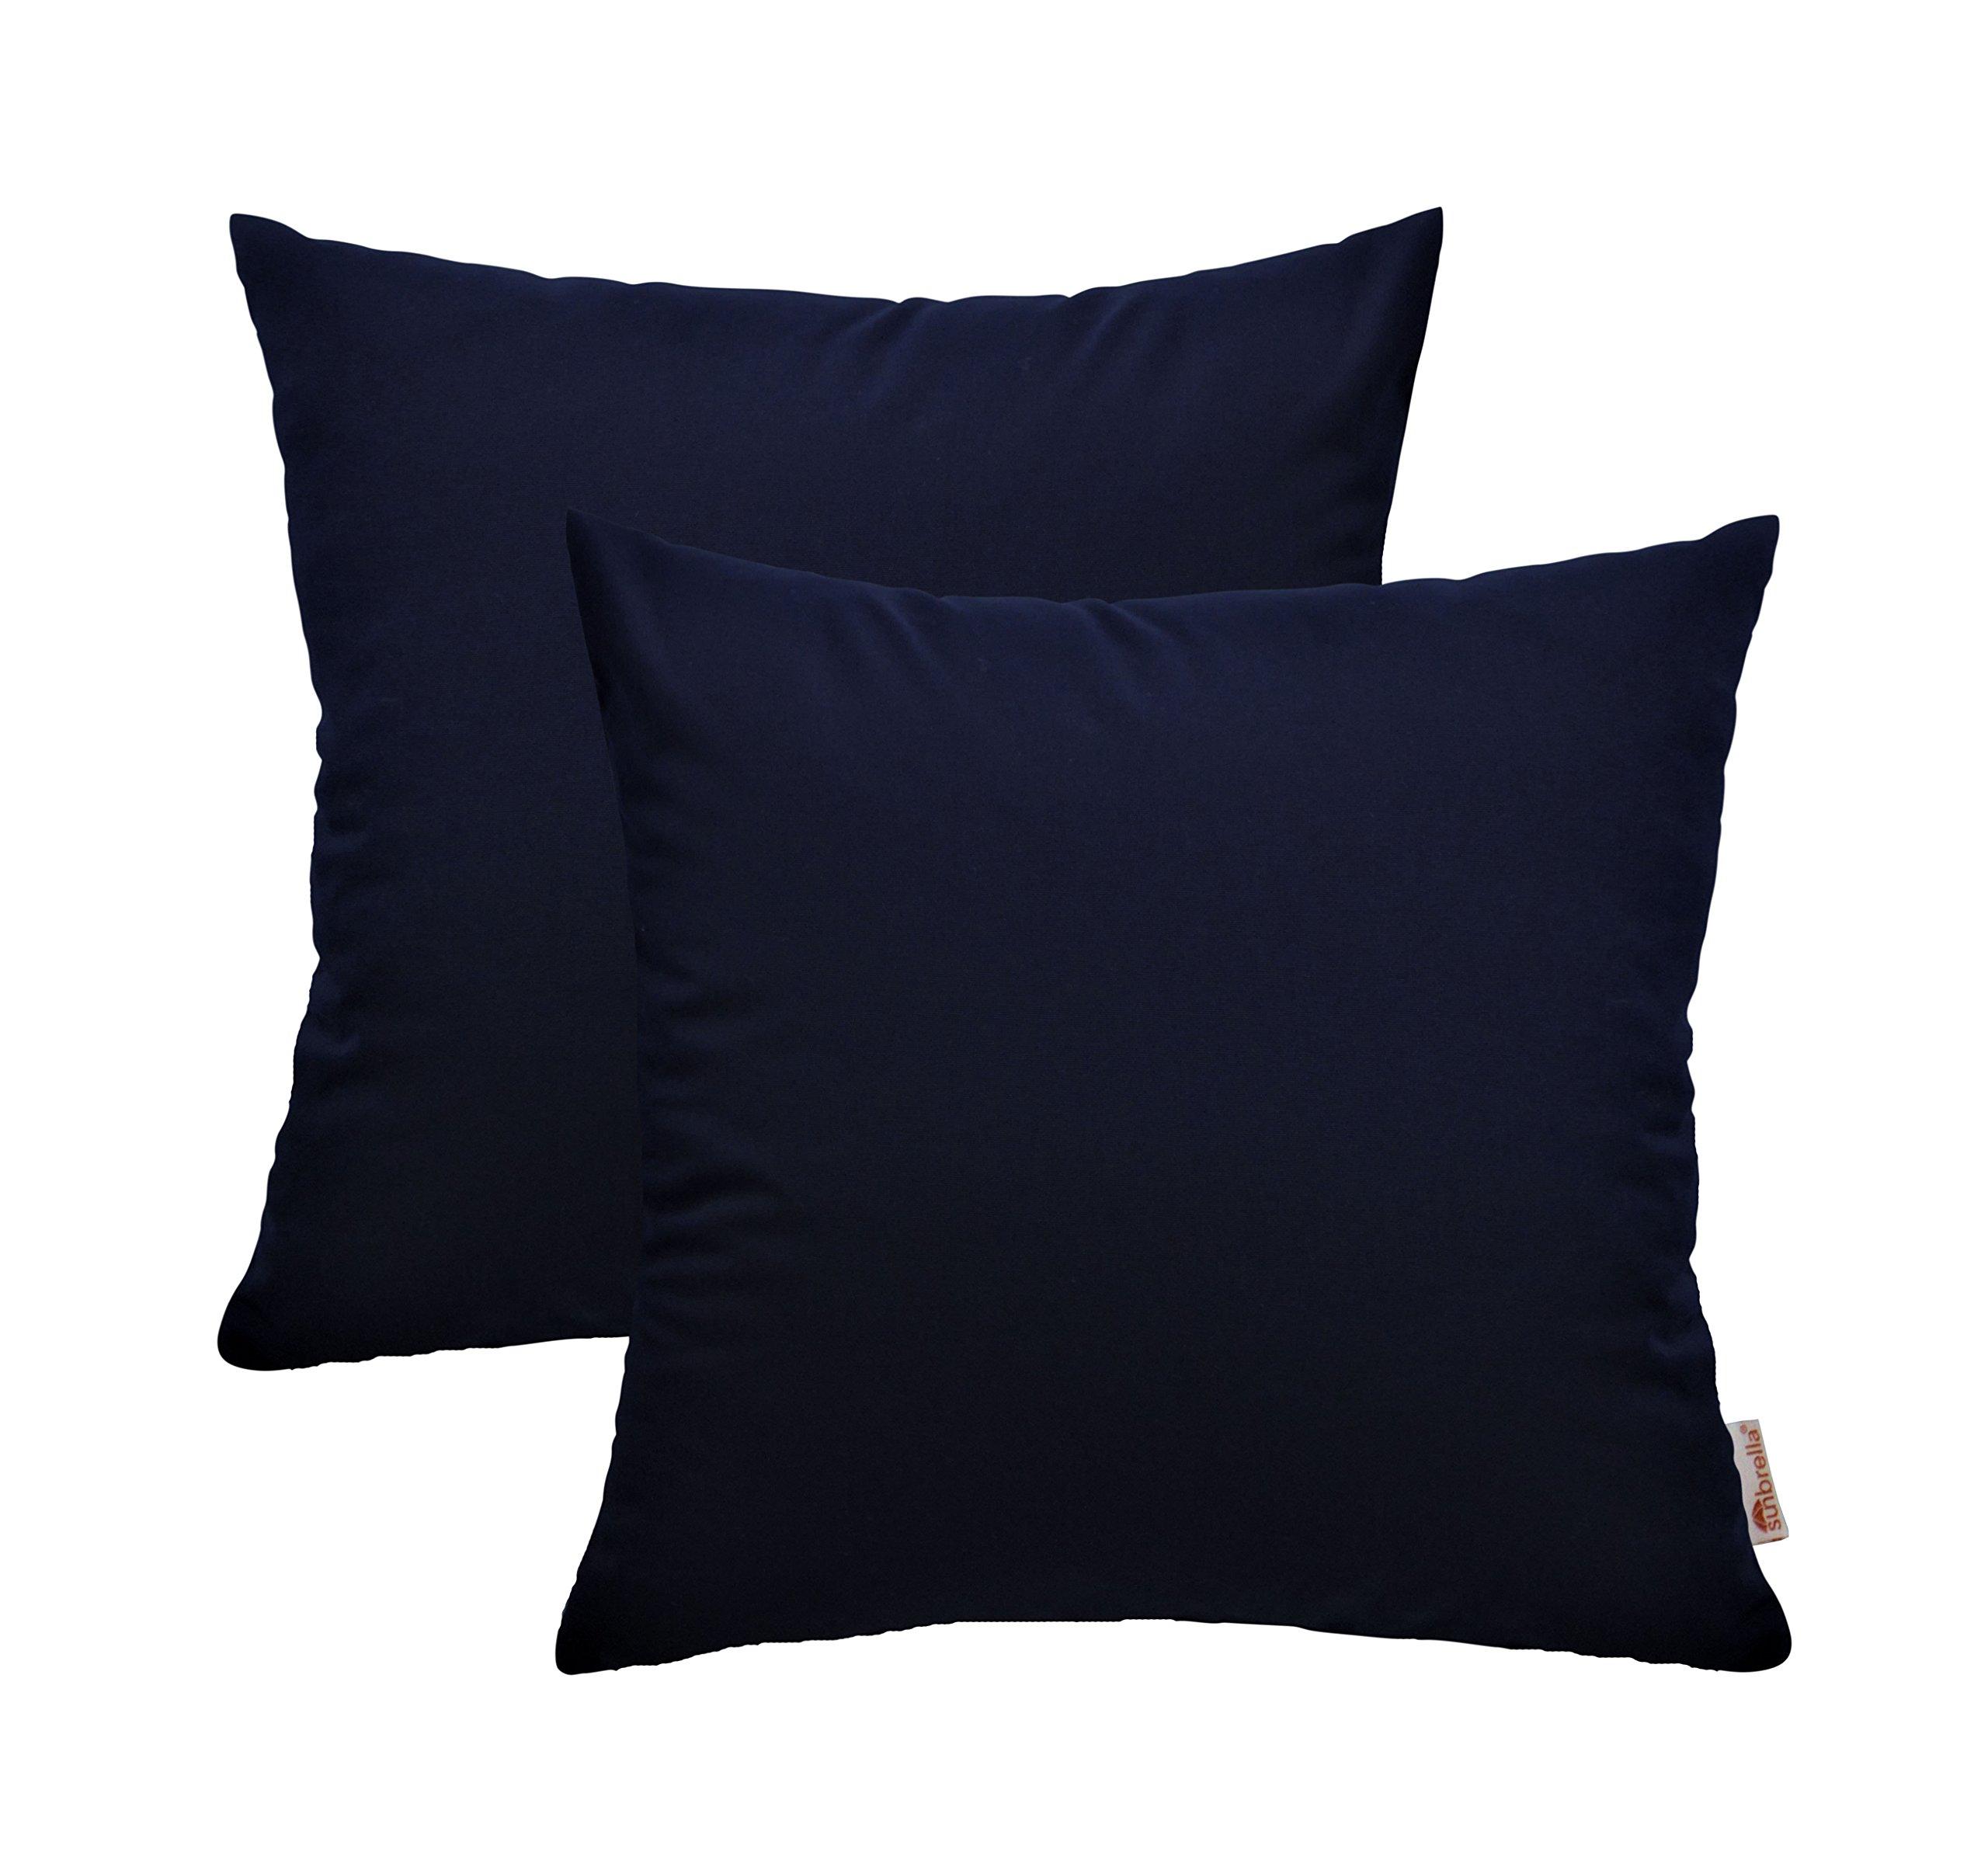 RSH Décor Set of 2 Indoor/Outdoor Decorative Throw Pillows Sunbrella Navy Blue - 20'' x 20''